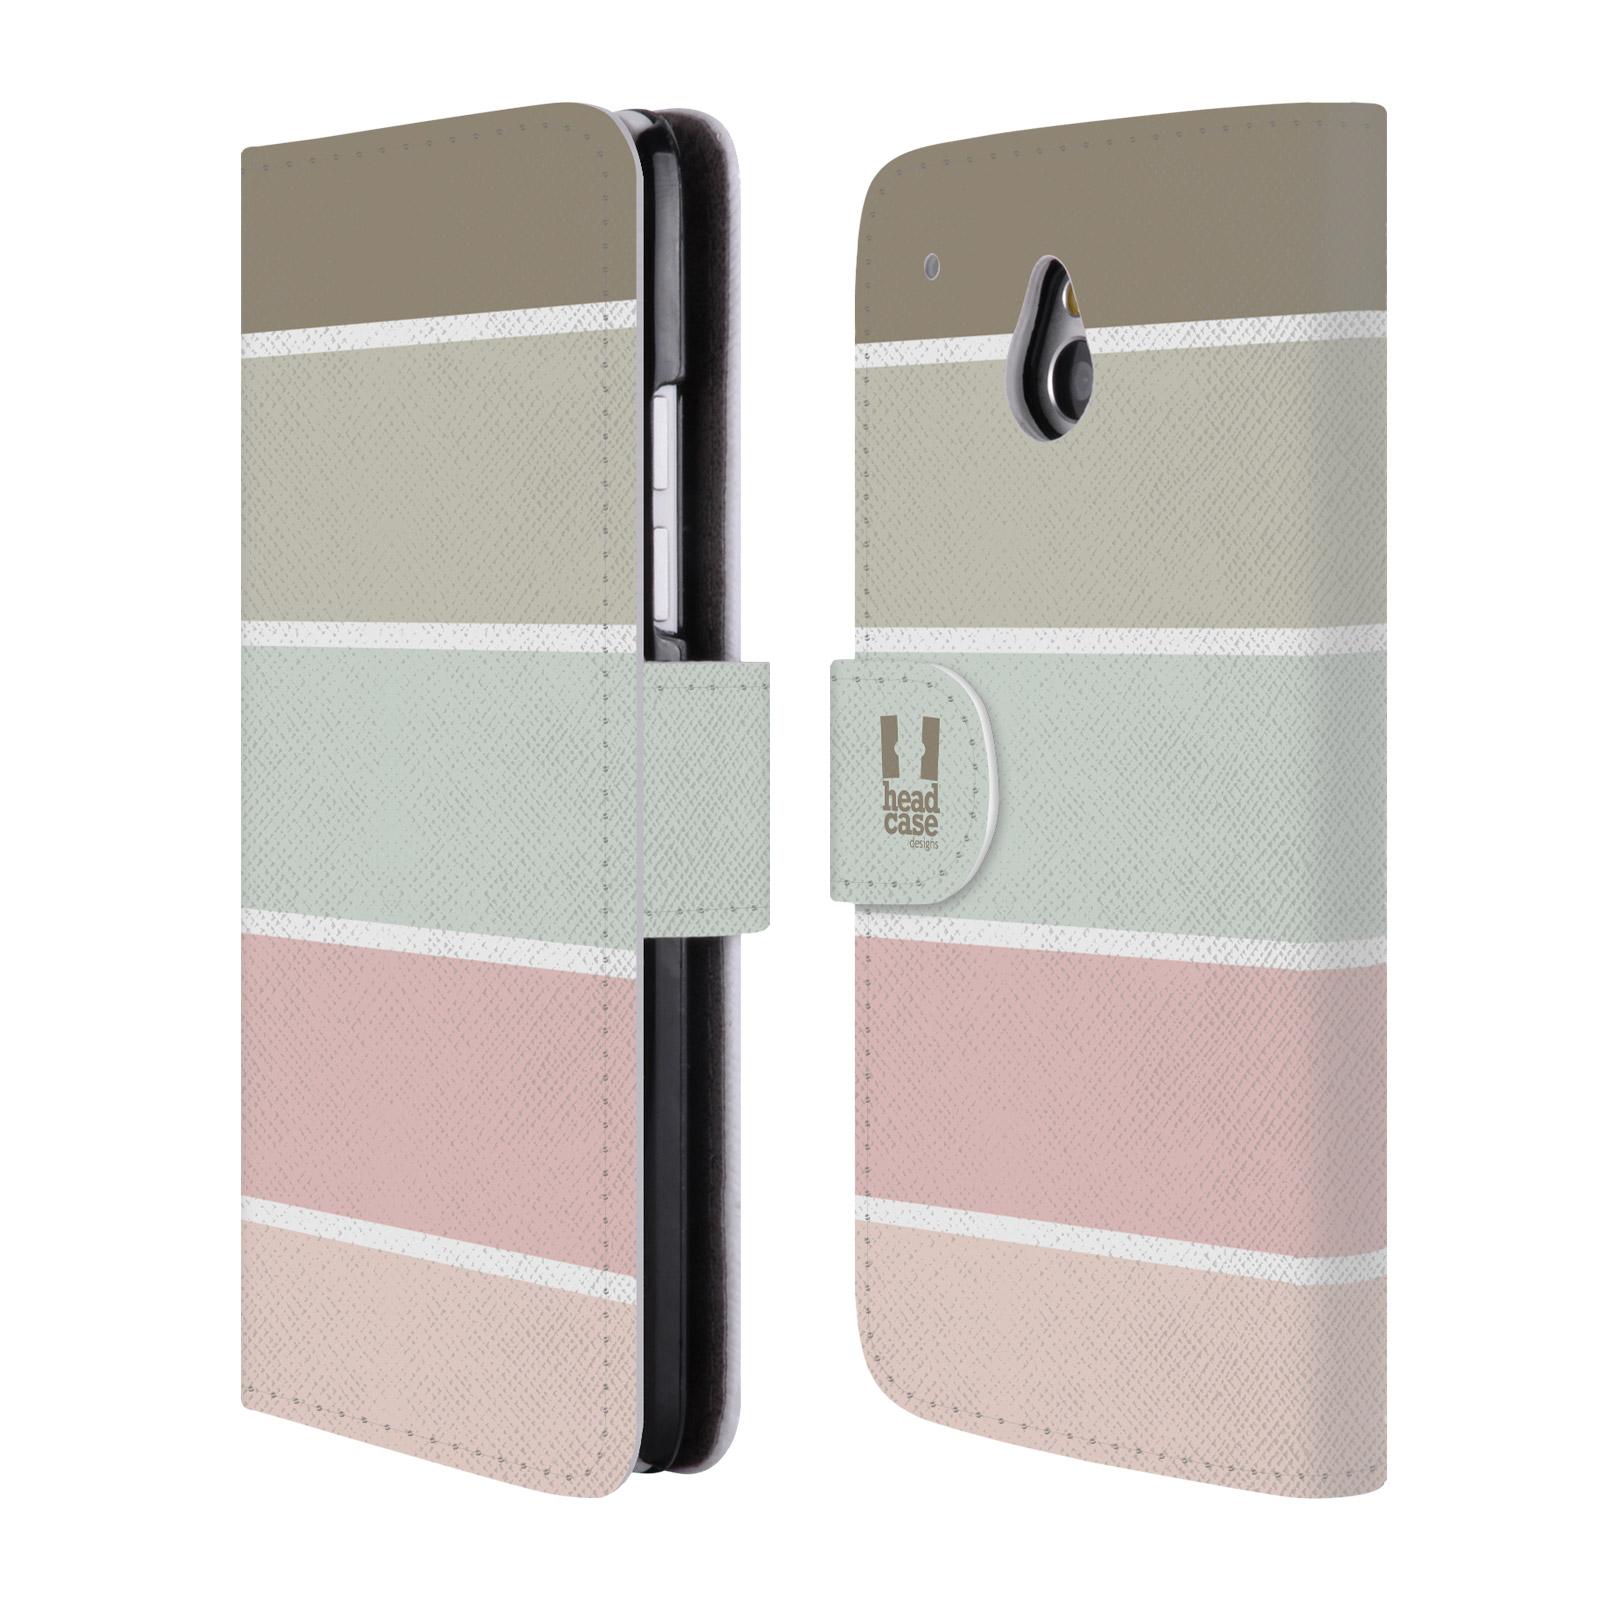 HEAD CASE Flipové pouzdro pro mobil HTC ONE MINI (M4) Francouzský venkov pruhy růžová a šedá